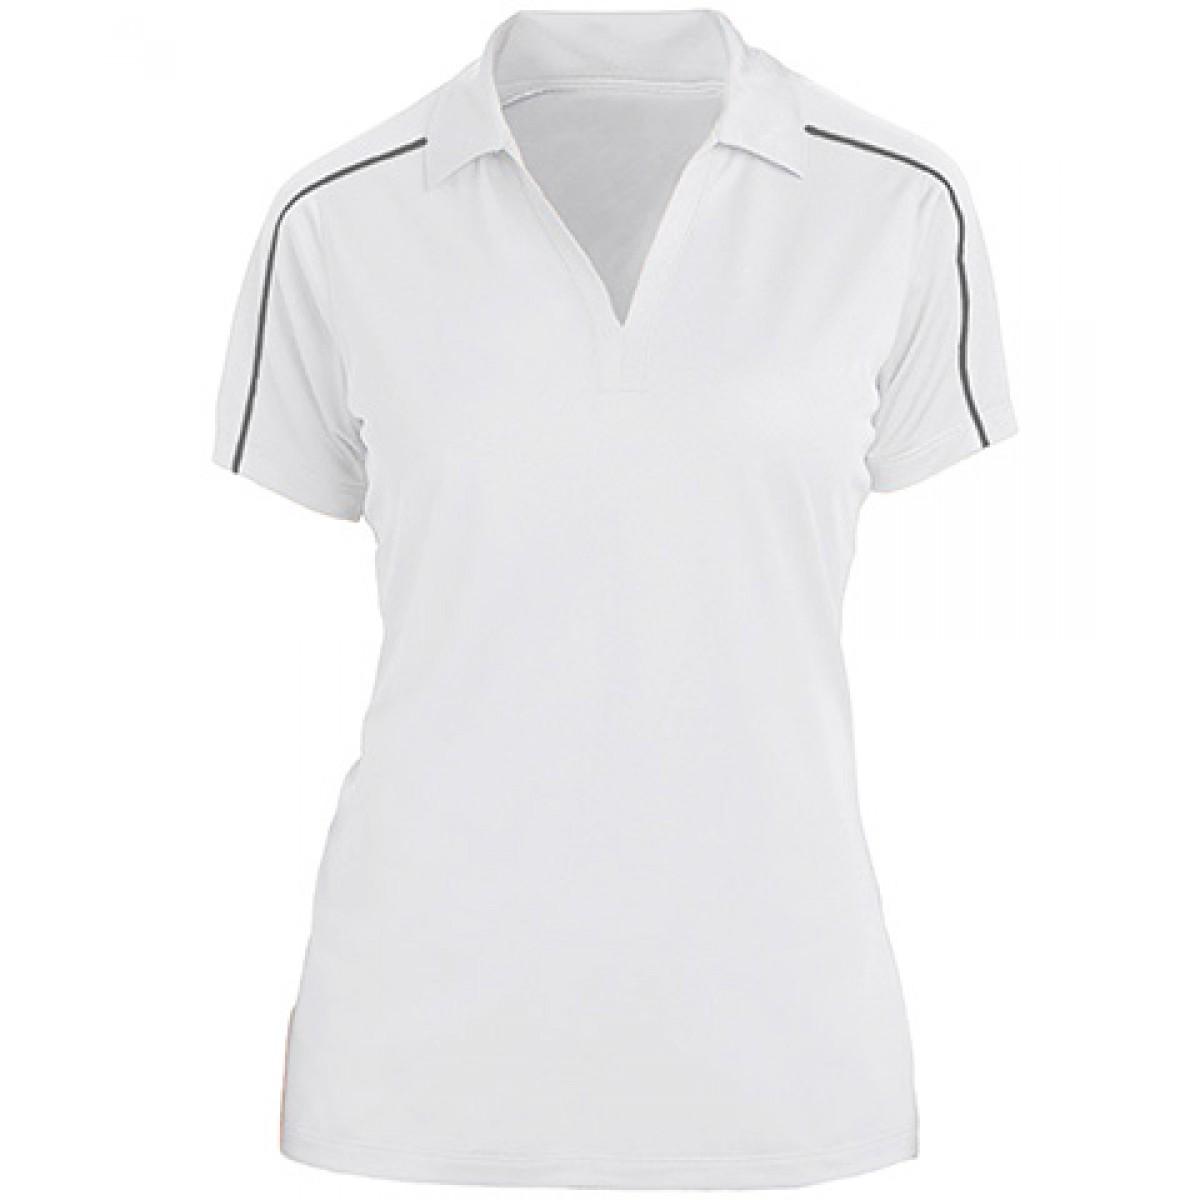 Sport-Tek Womens Piped Short Sleeve Polo